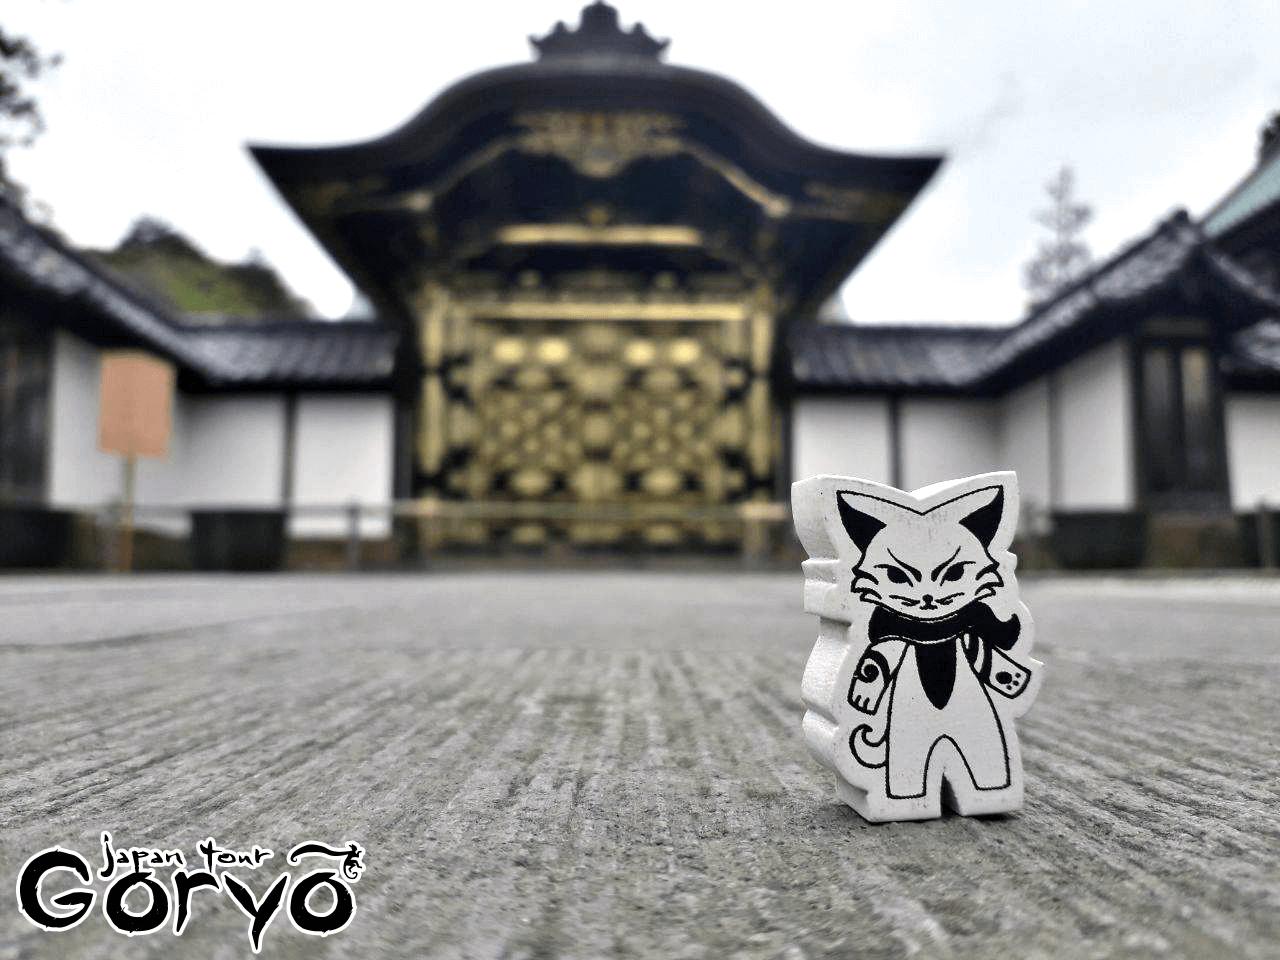 Goryo Japan Tour